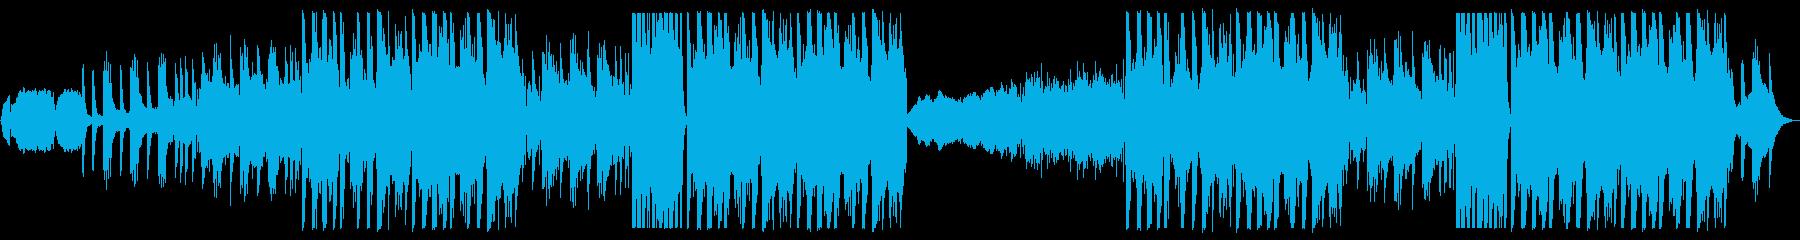 Japanese style EDM of shakuhachi and koto's reproduced waveform